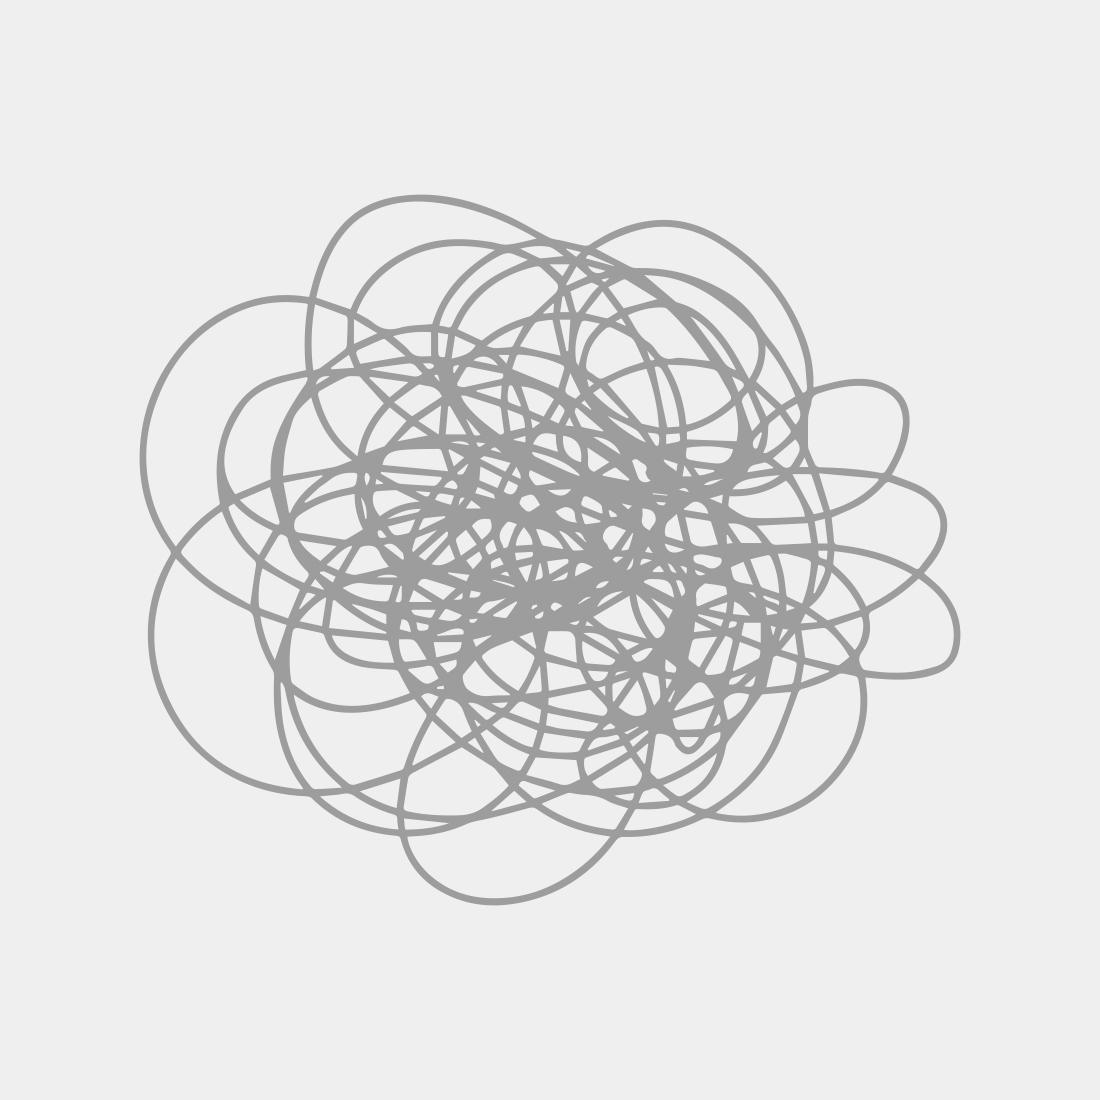 Kuretake Fudebiyori Metallic Brush Pen Silver